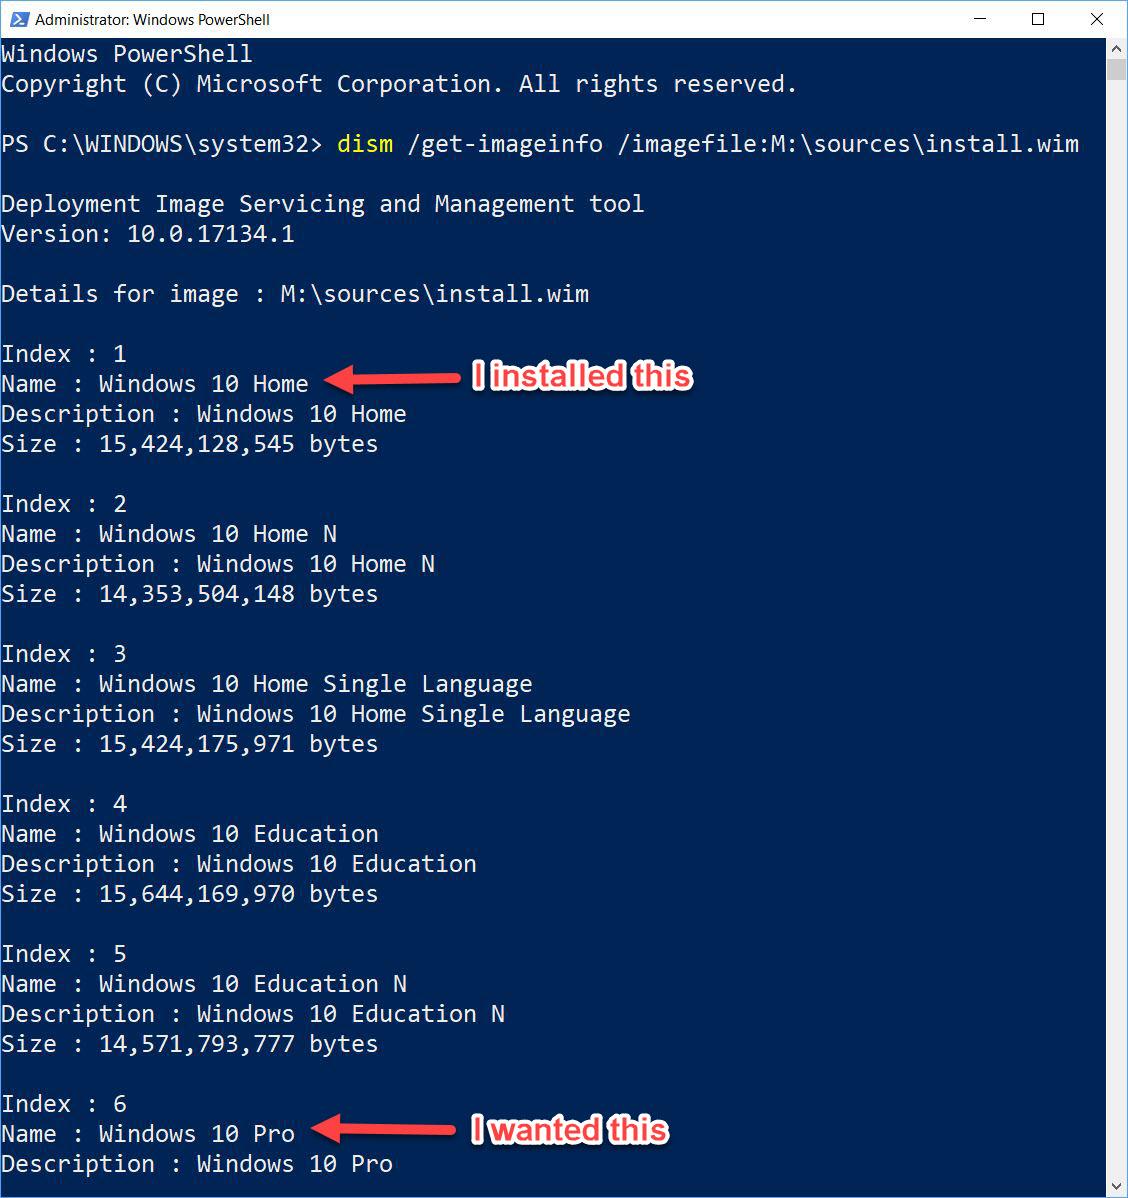 DISM Mount-Image Grabs Selected Image Installer.wiminfo